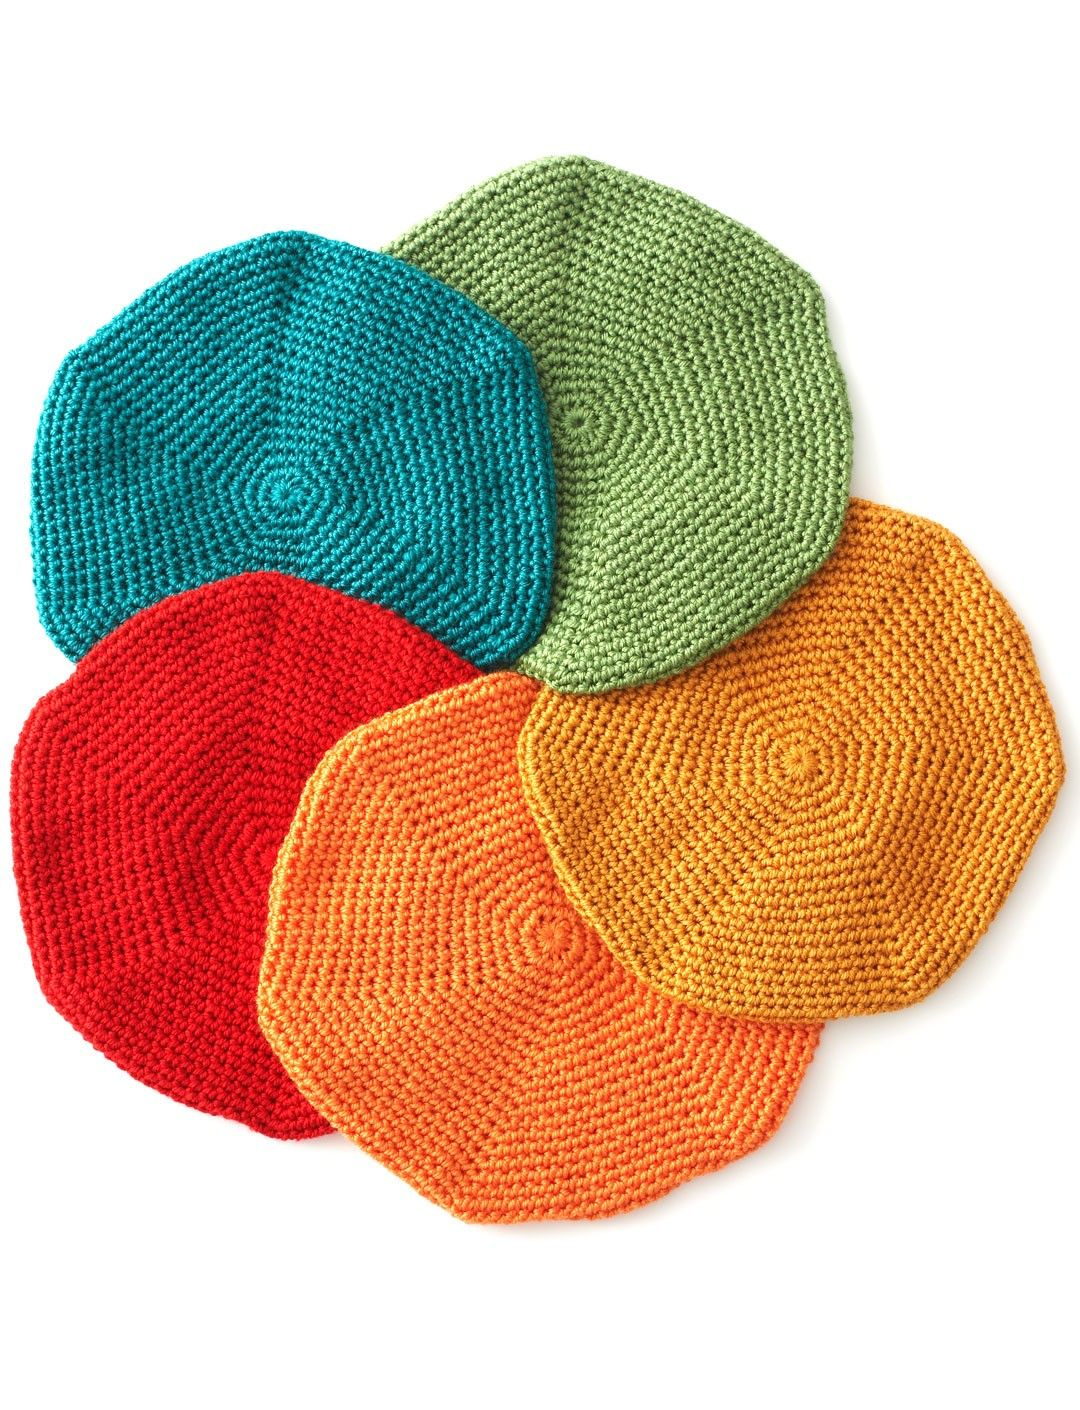 Yarnspirations.com - Bernat Classic Crochet Beret ...